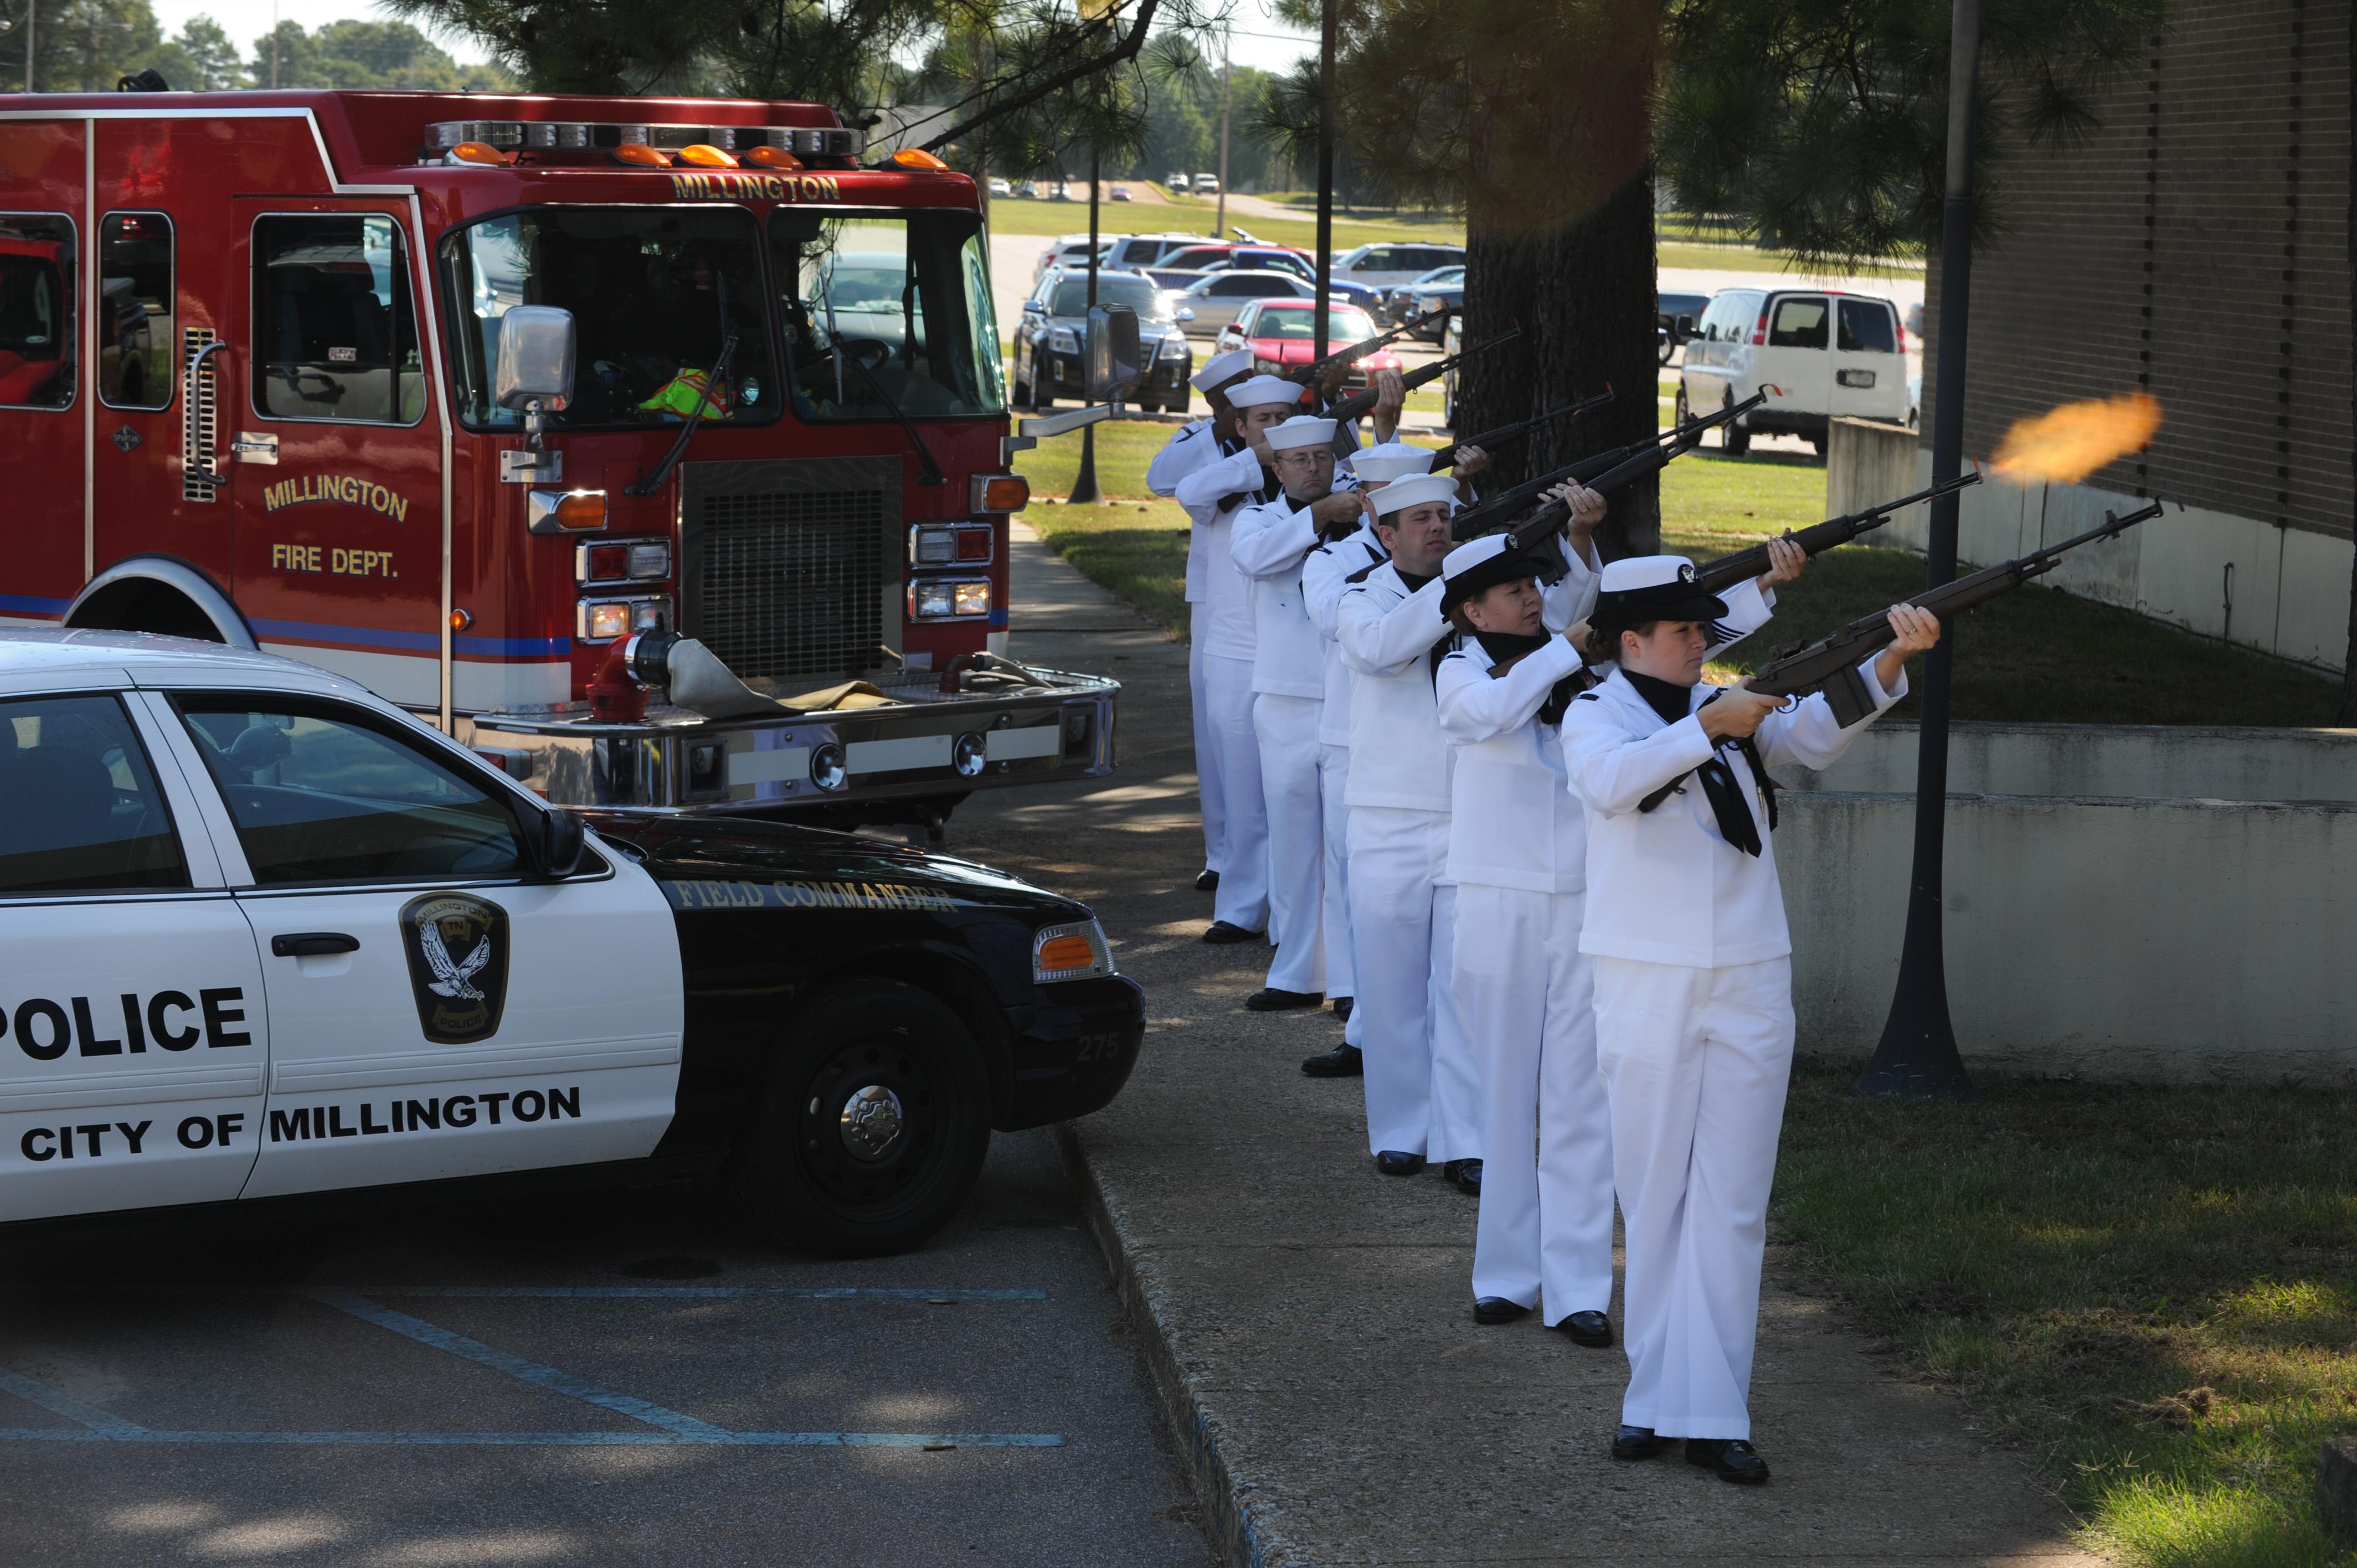 Fire Department Activity August  Battery Park City